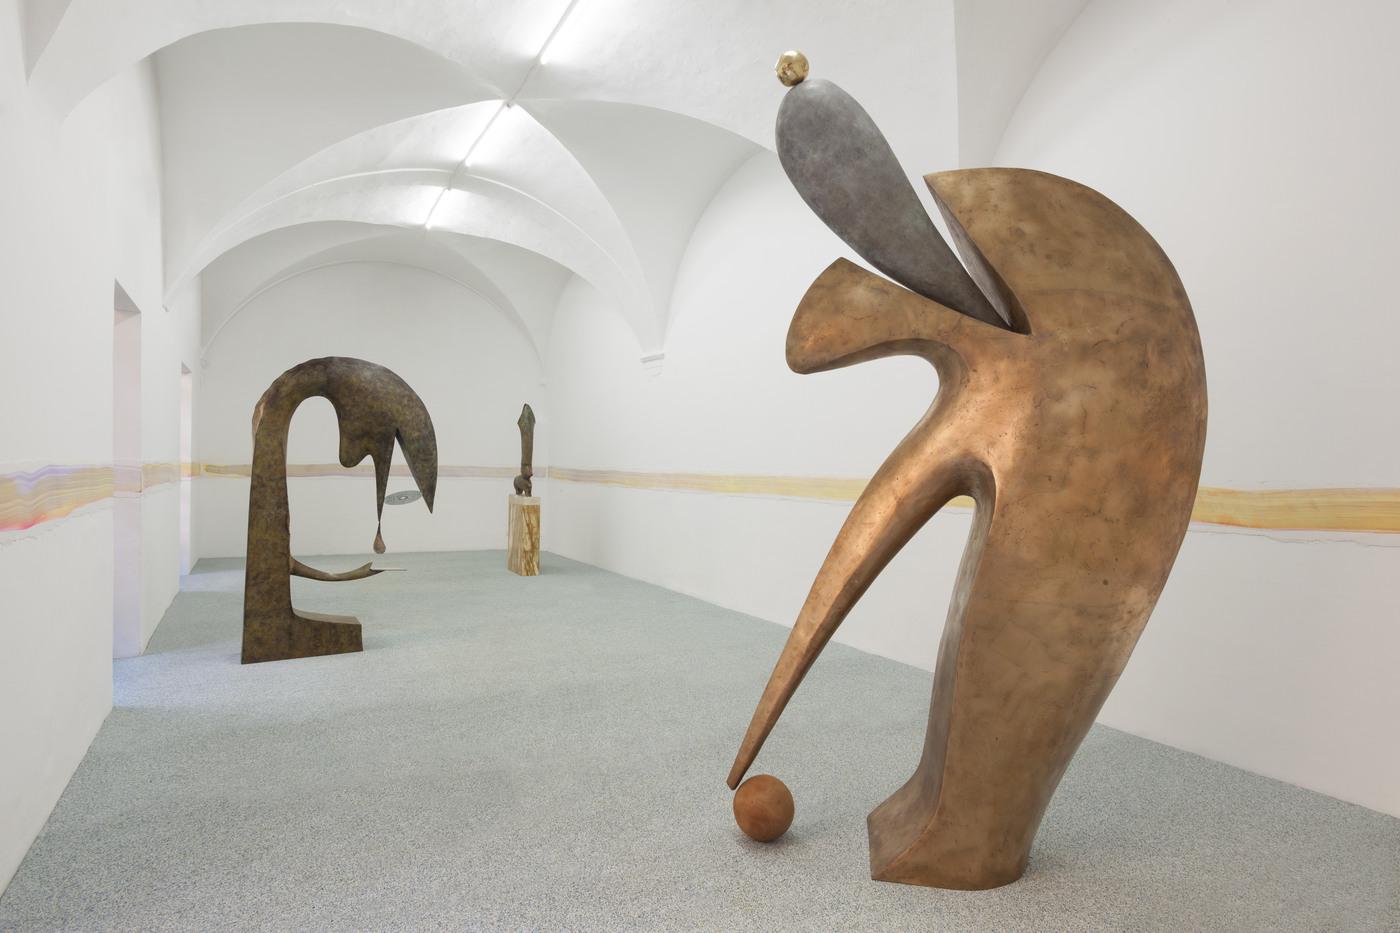 26. Camille Henrot, Monday. Installation view, Fondazione Memmo, Rome, 2016jpg